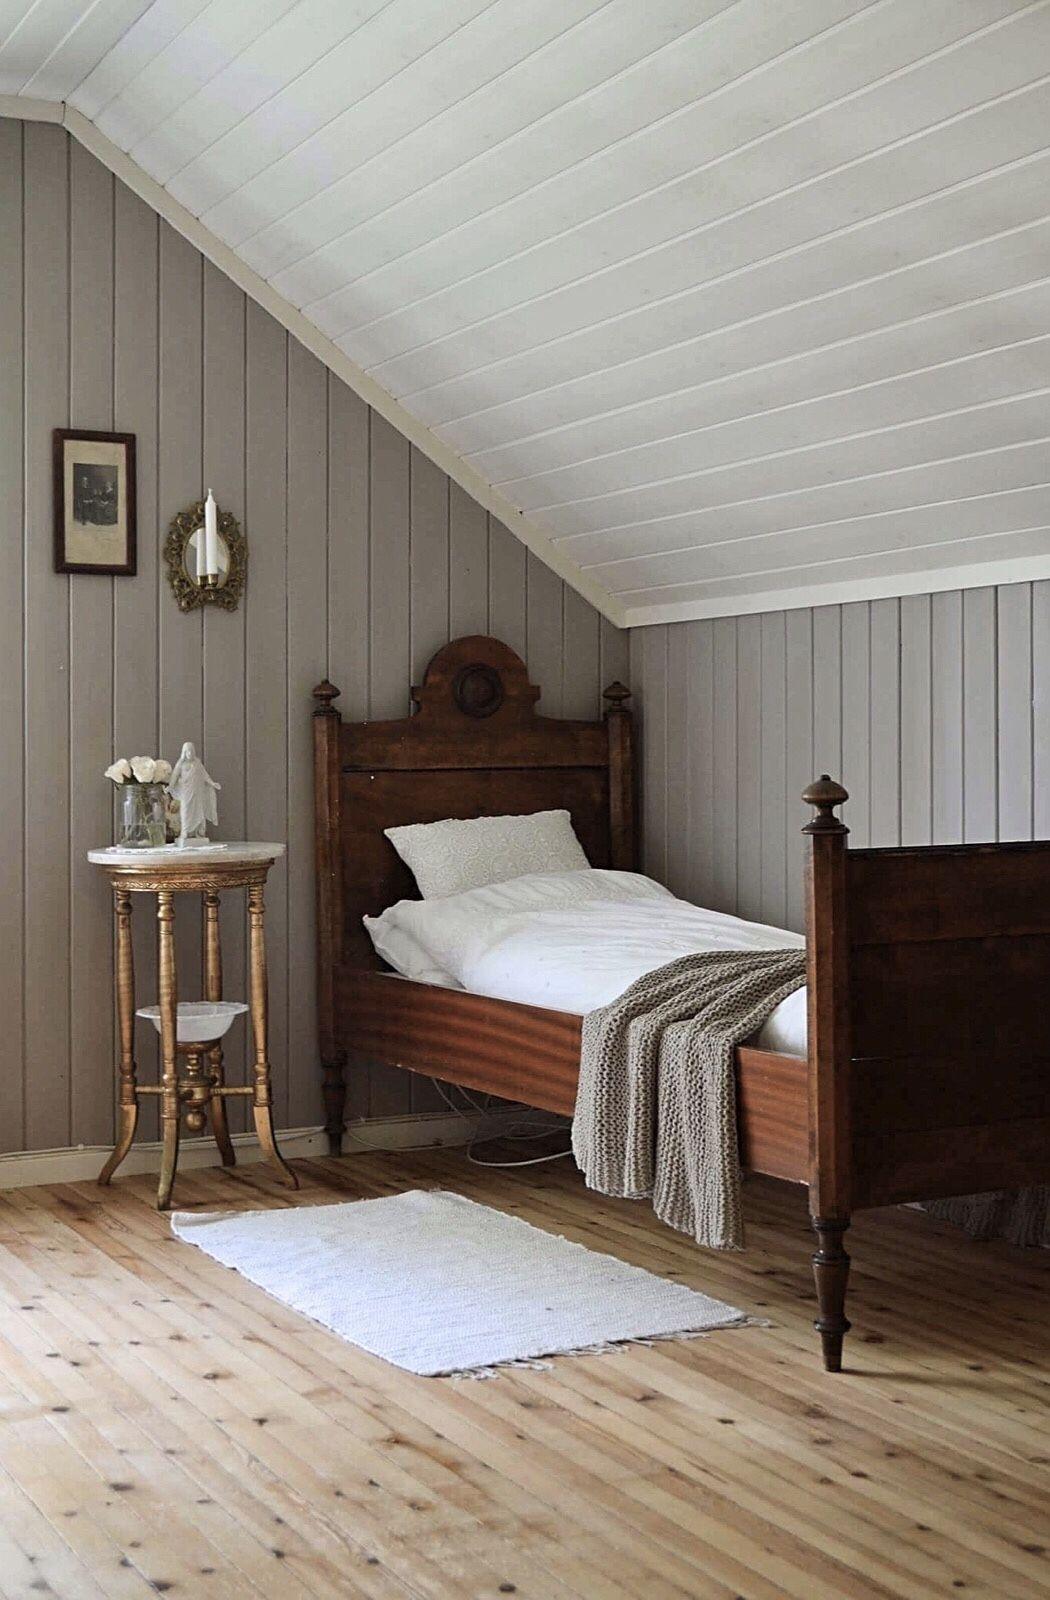 Photo of Gammeldagse soverom, gammel seng, gamle nattbord, fillerier, landlig interiør, …